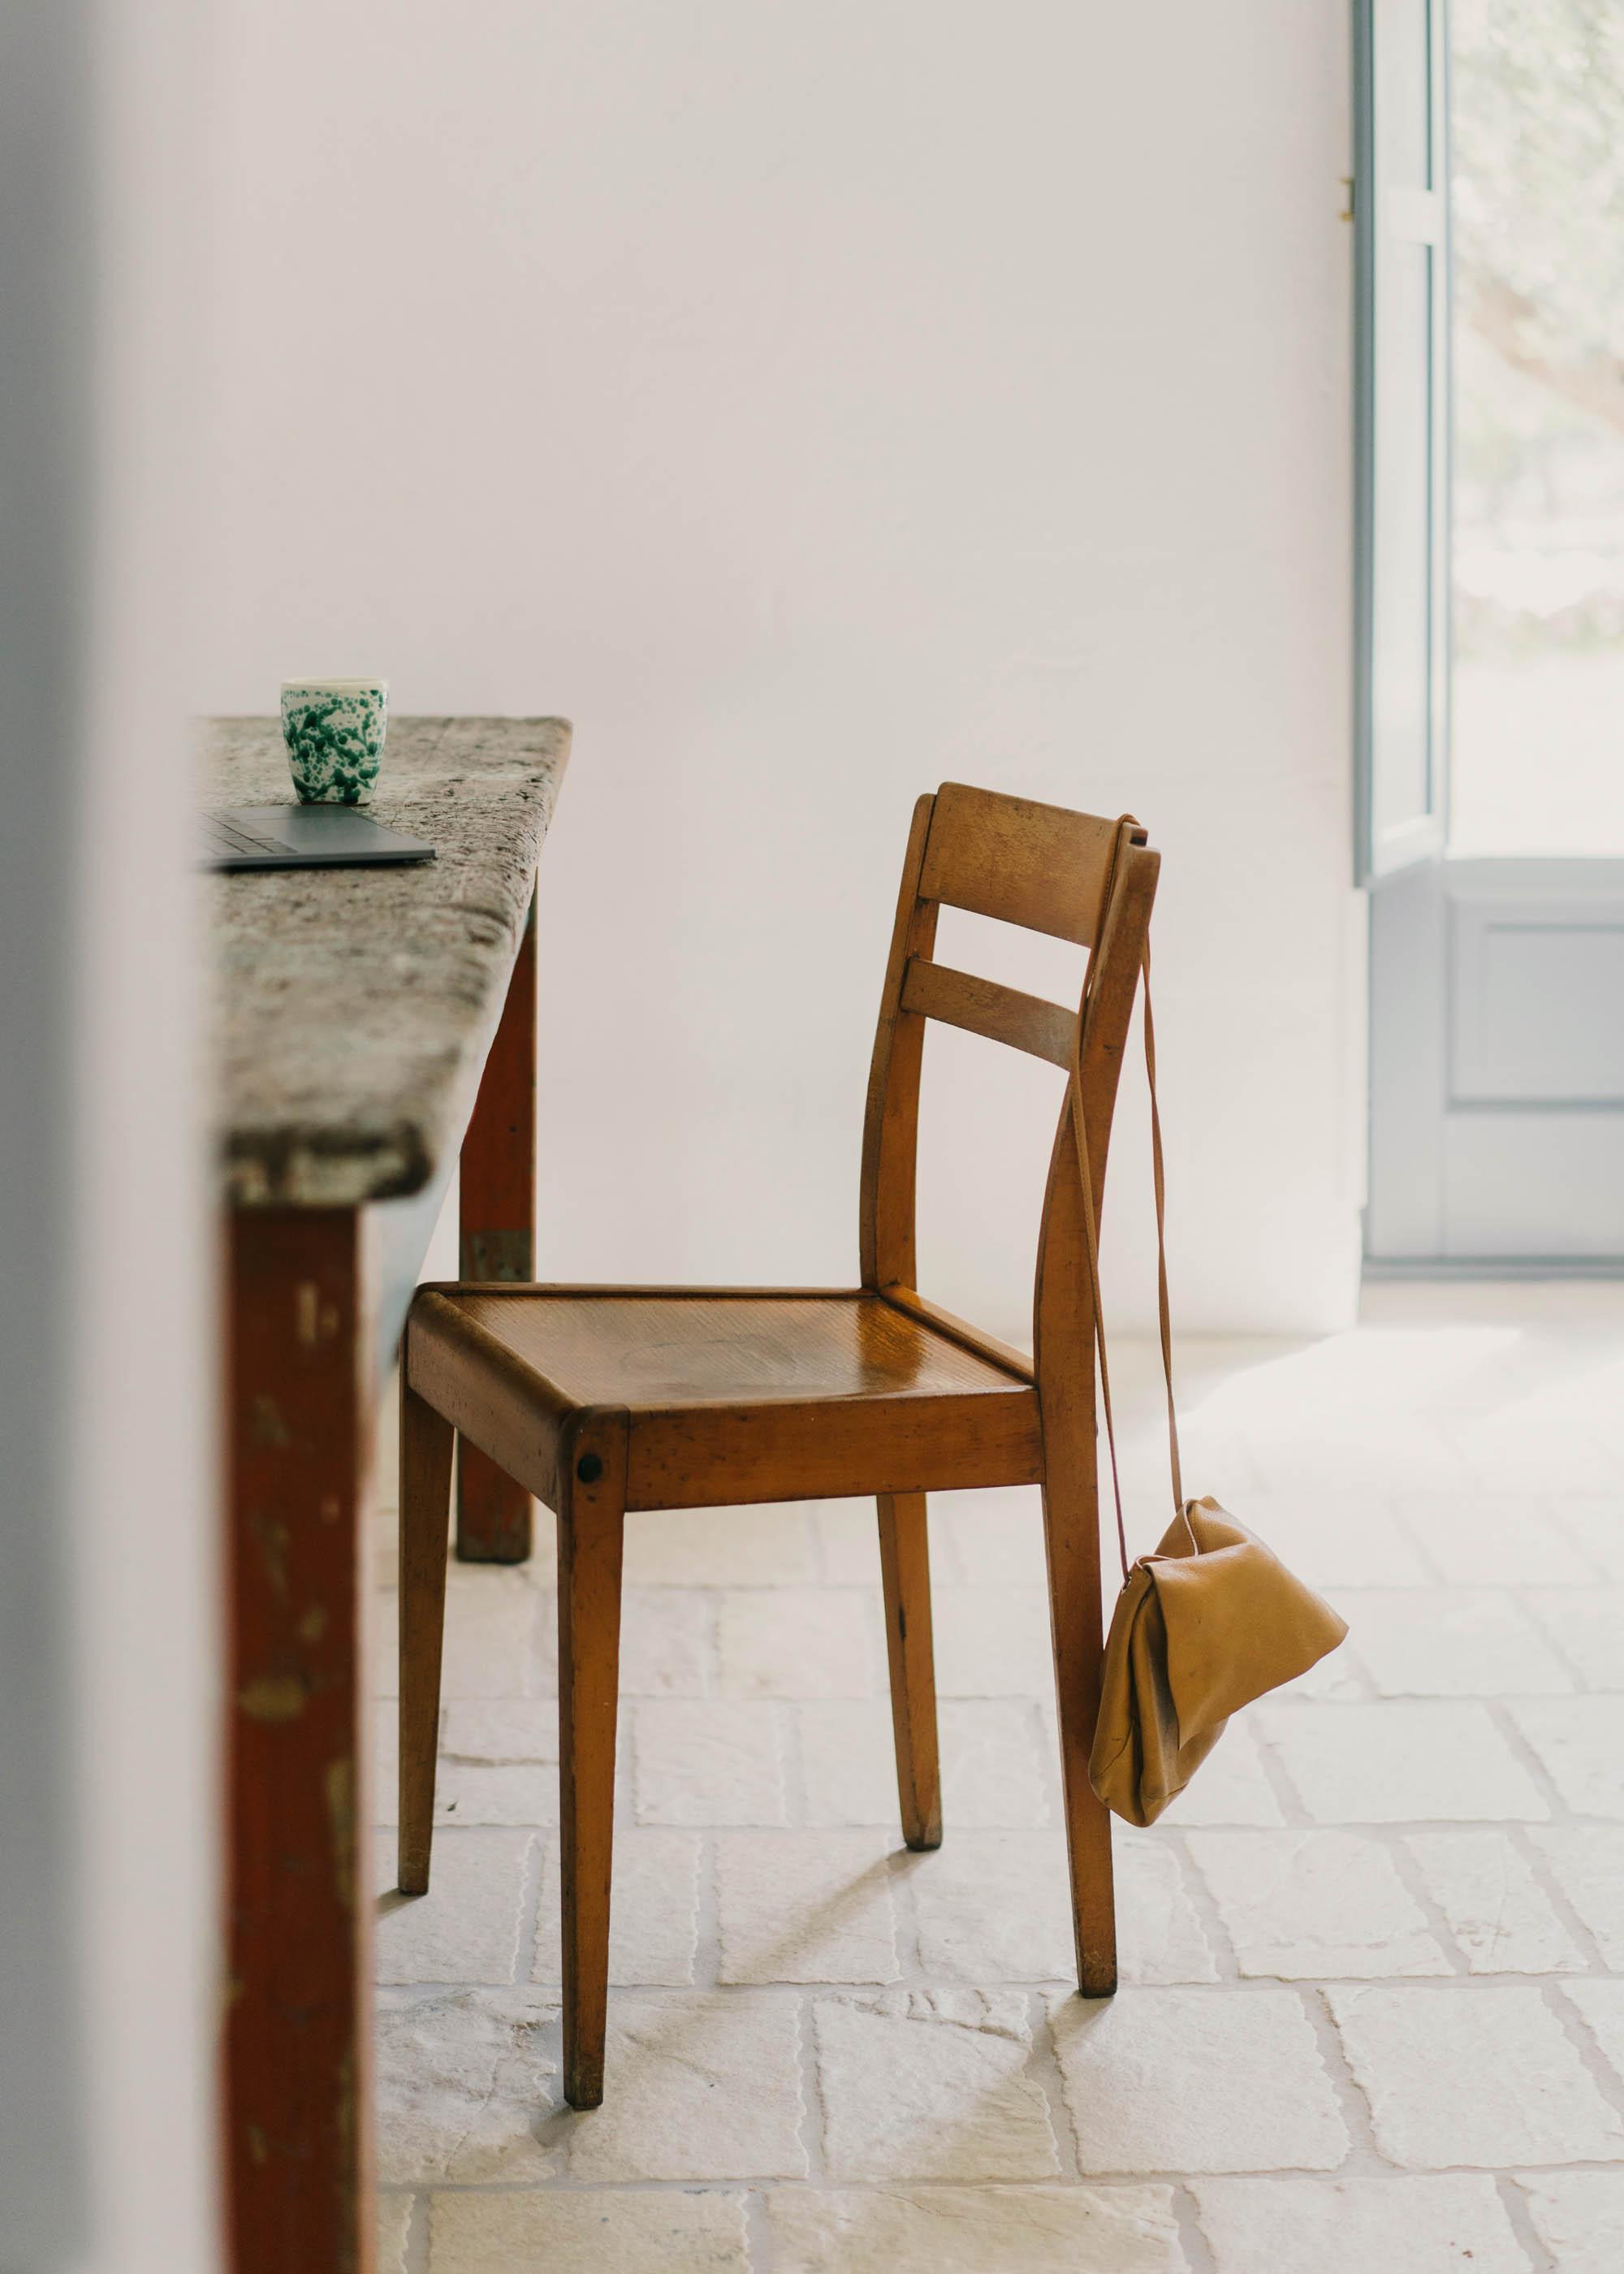 #editorial #italy #puglia #masseria #morosseta #openhouse #chairs #hotels